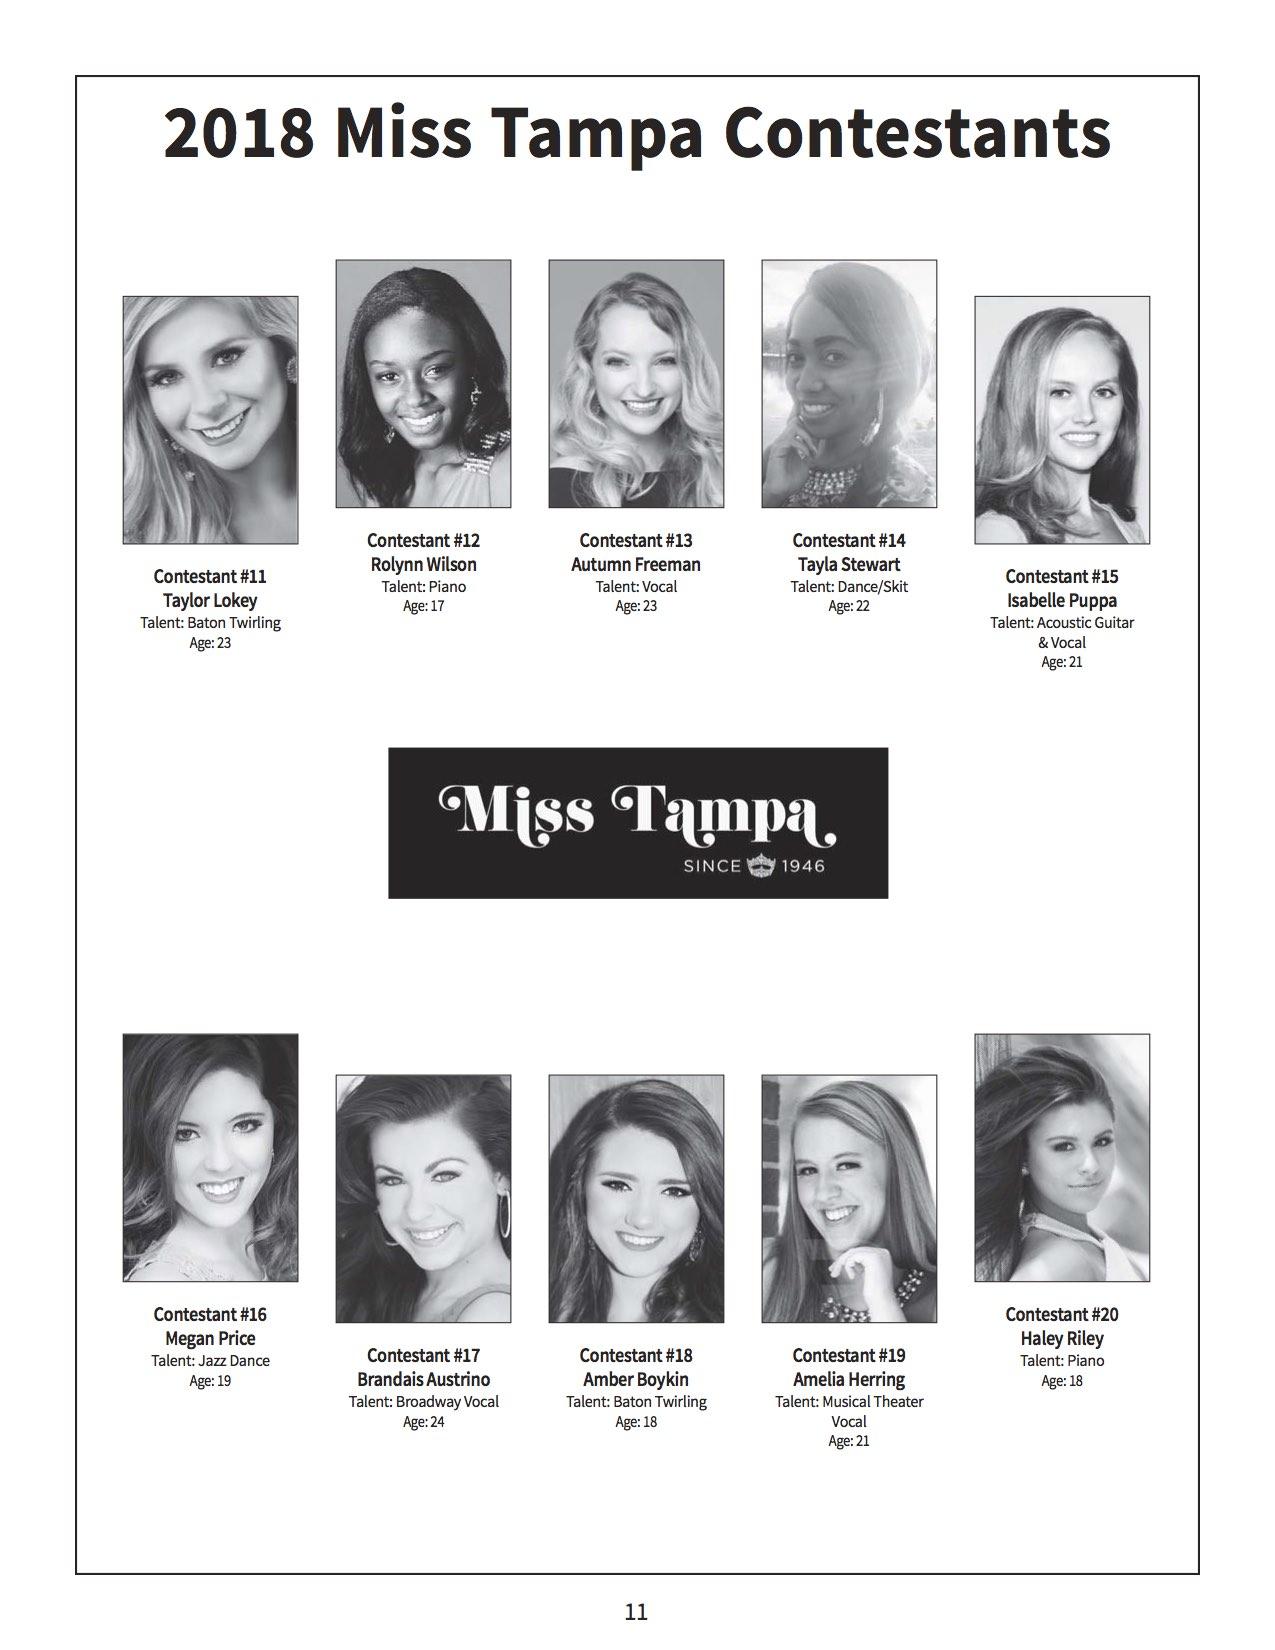 Miss Tampa 2018 Contestants final 1.30.18-b.jpg